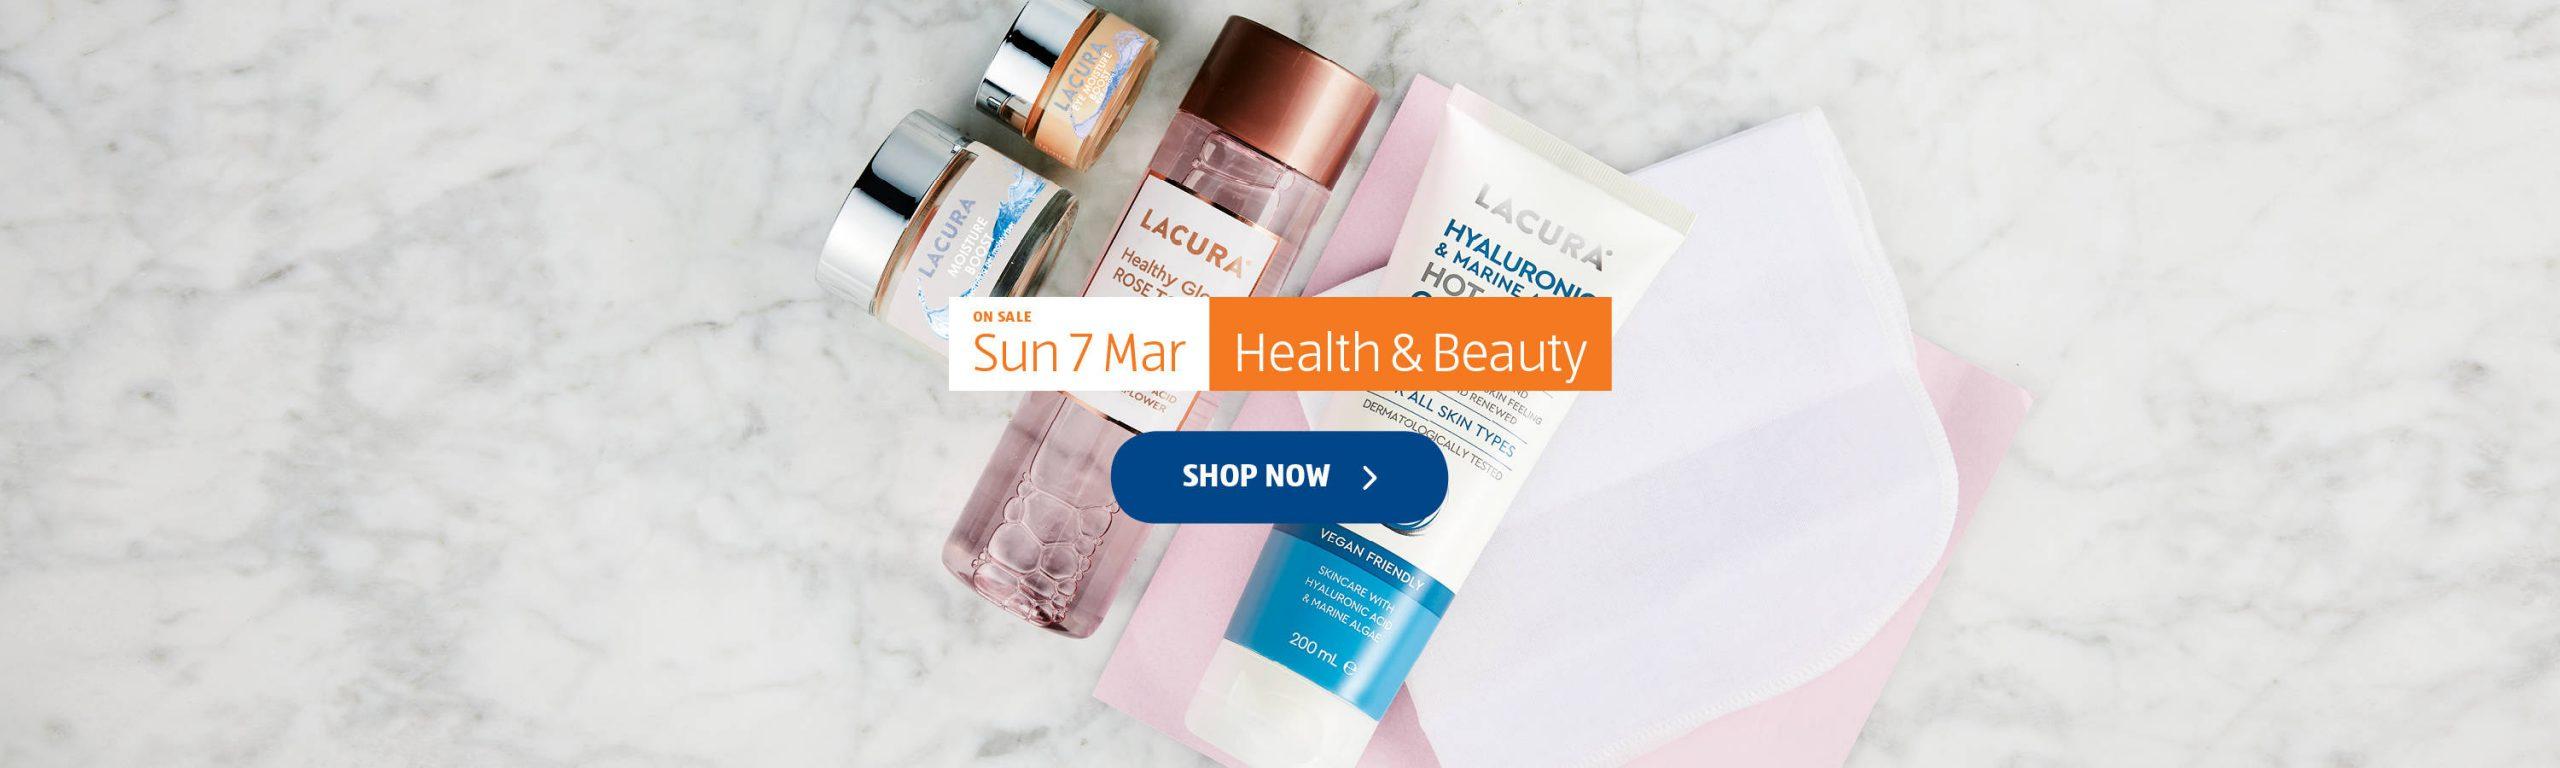 ALDI Health & Beauty 7th March 2021 ALDI Sunday Offers